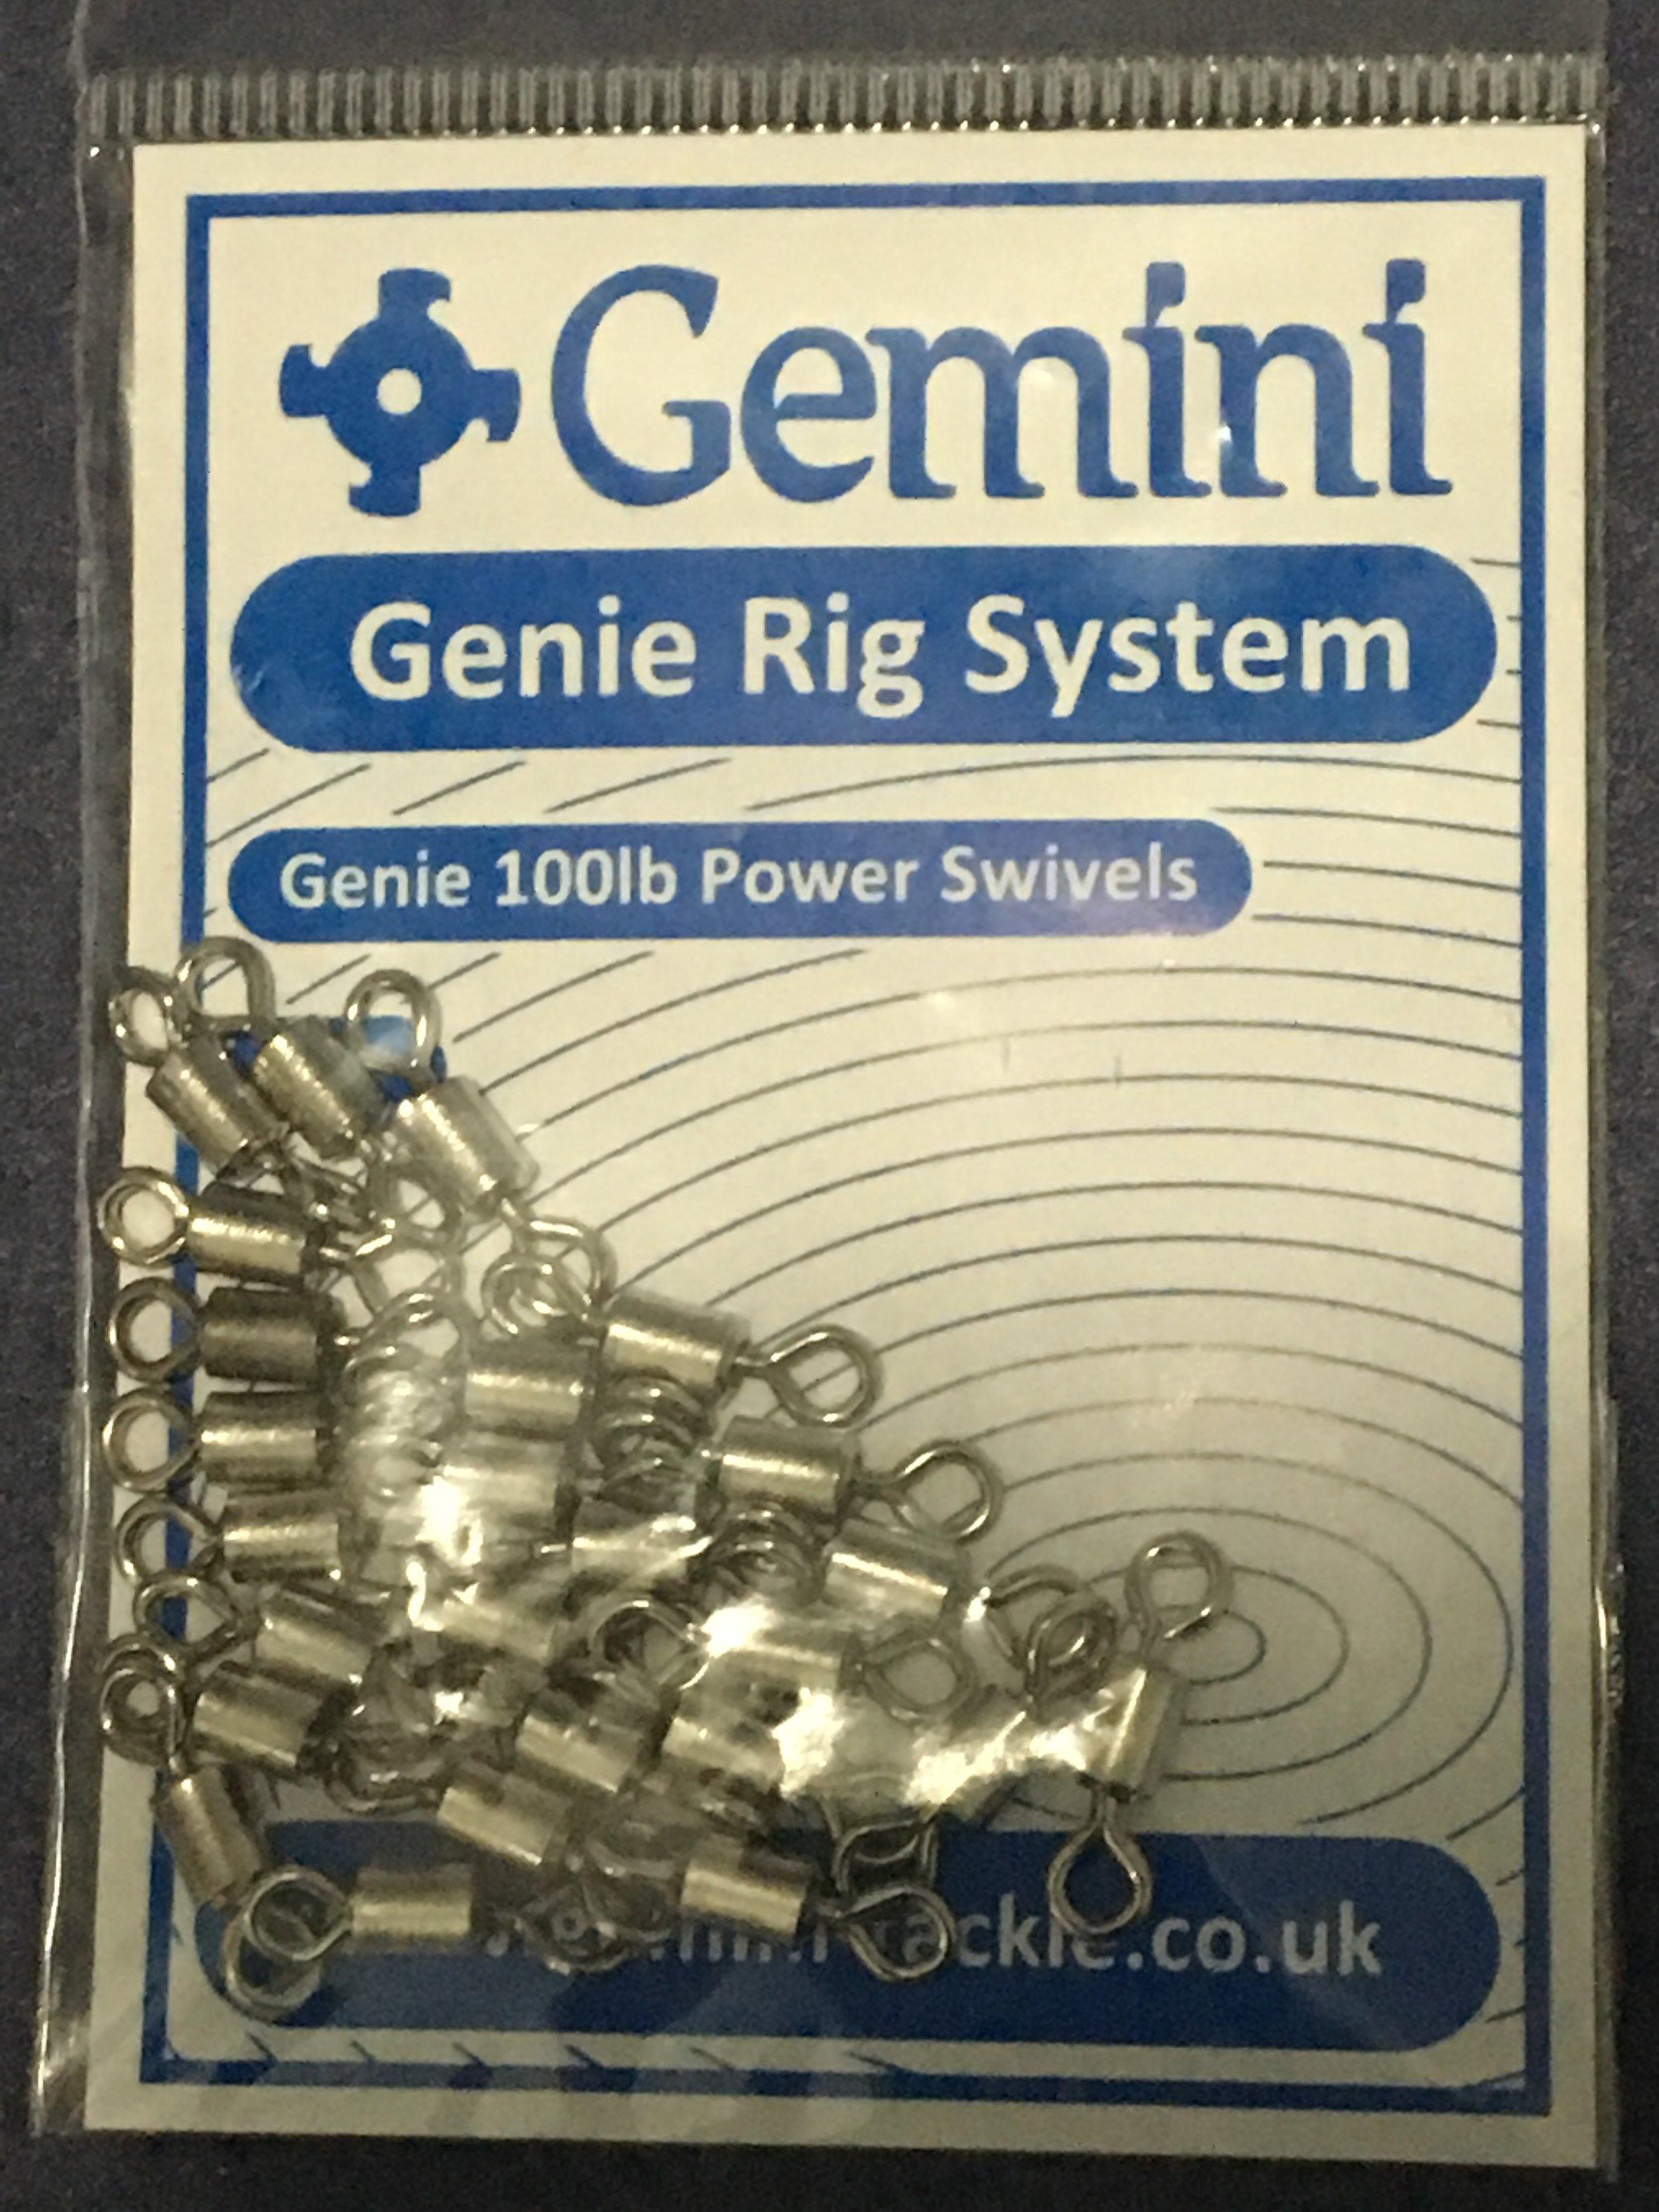 Genie 100lb Power Swivels Gemini Rig System 25/'s